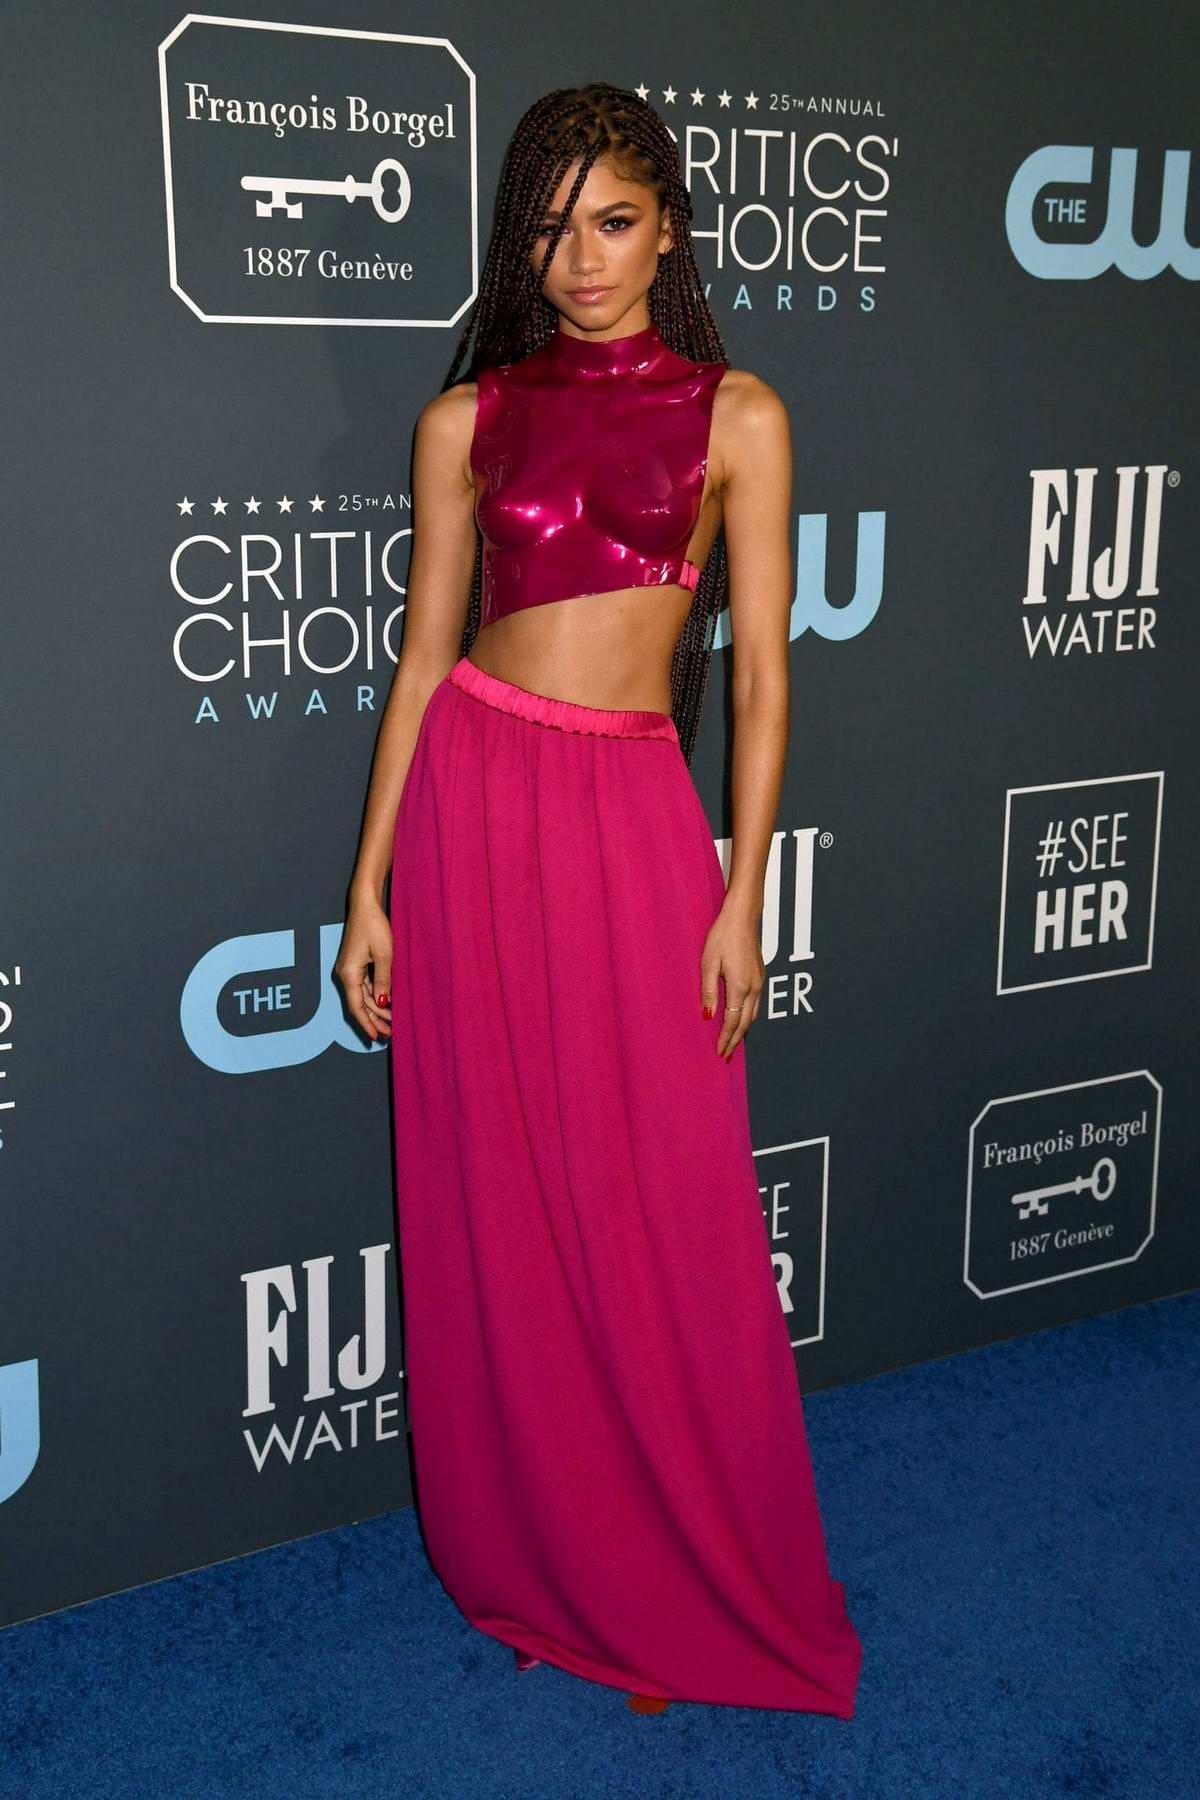 Zendaya attends the 25th Annual Critics' Choice Awards at Barker Hangar in Santa Monica, California